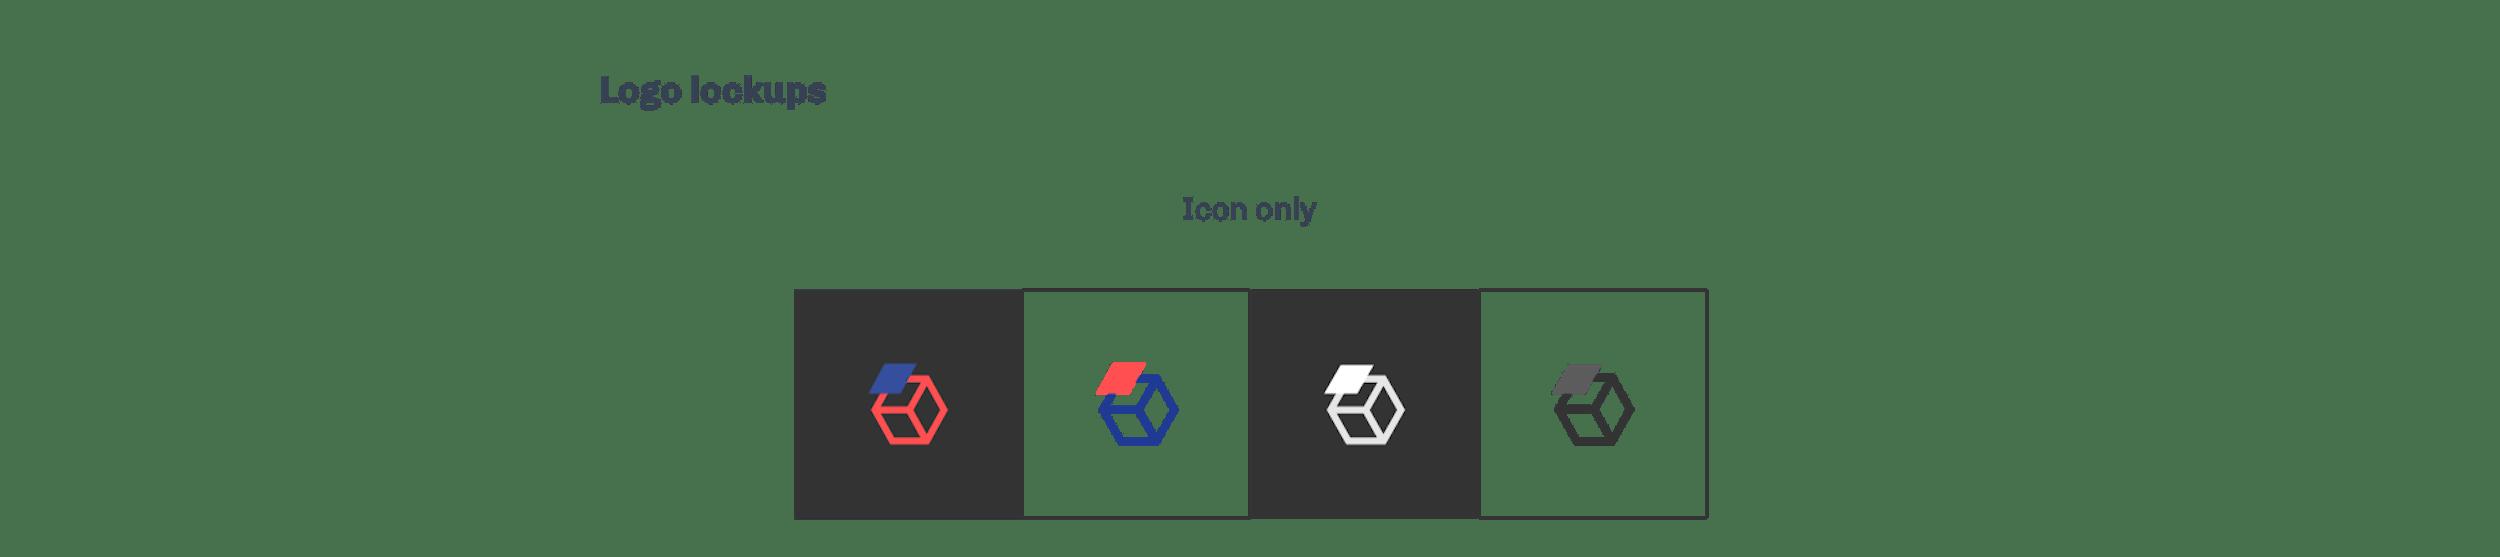 1559235262 logo2